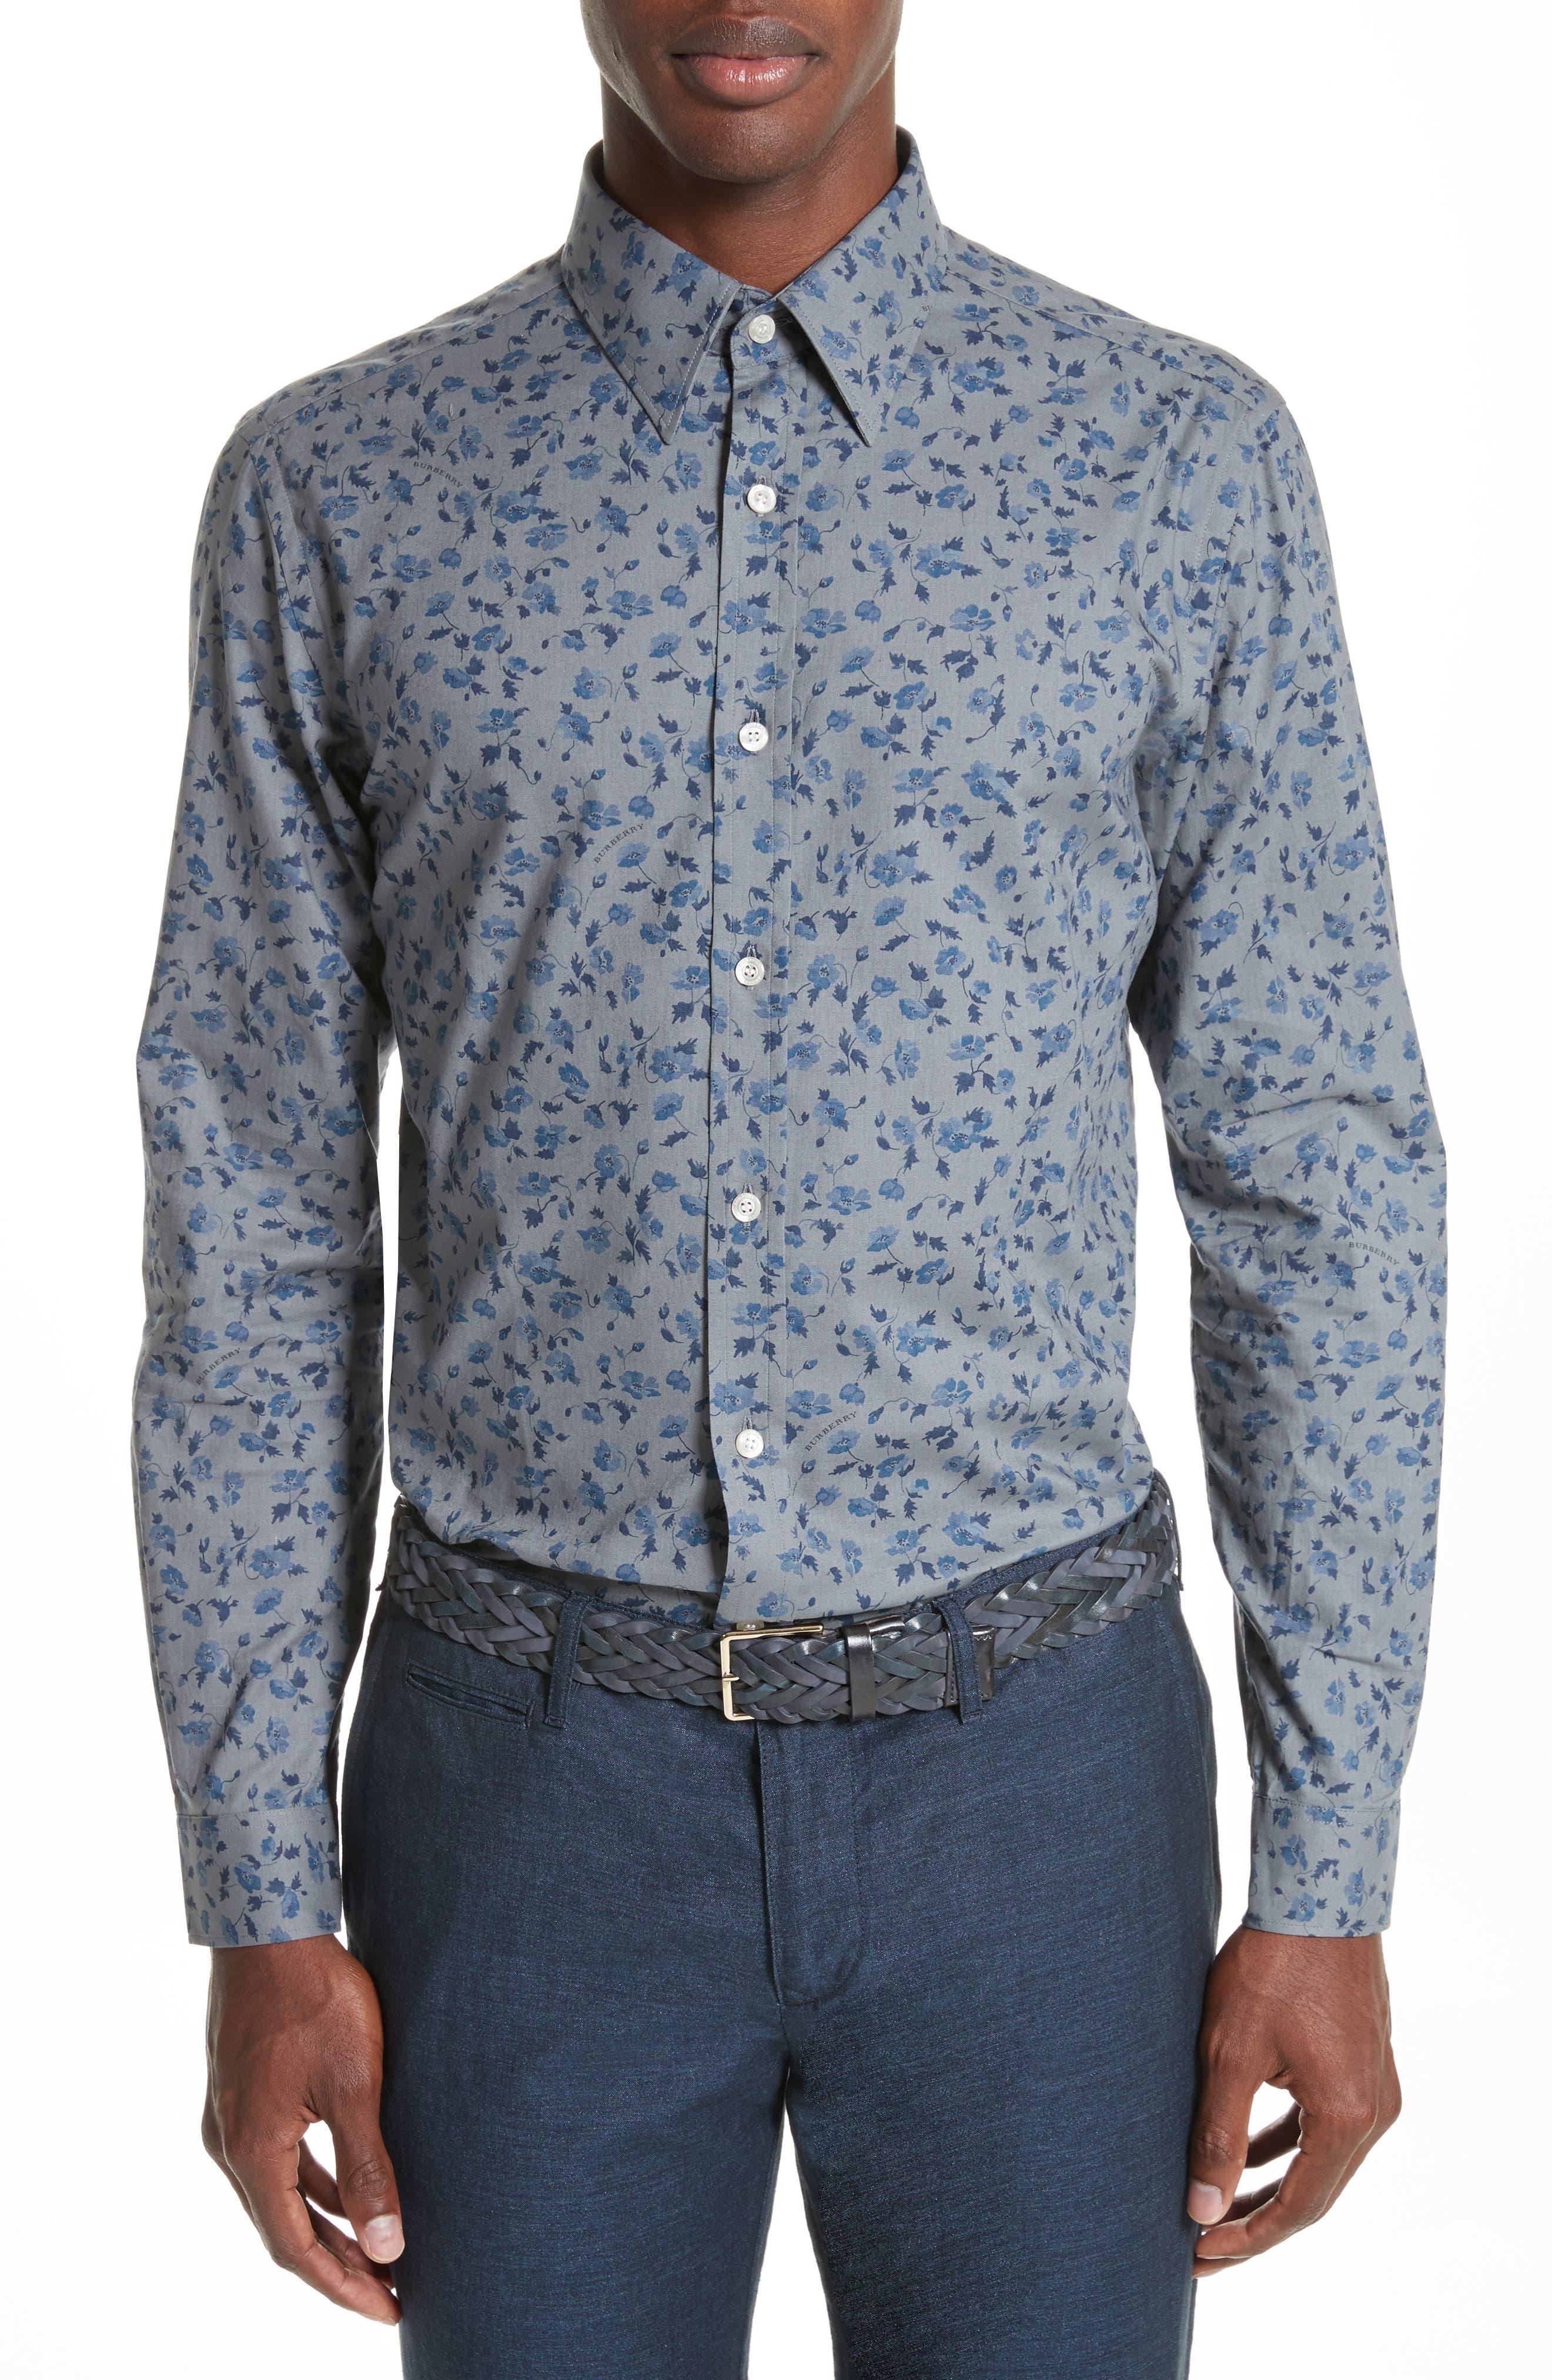 Connock Acdgi Classic Sport Shirt,                         Main,                         color, Stone Blue